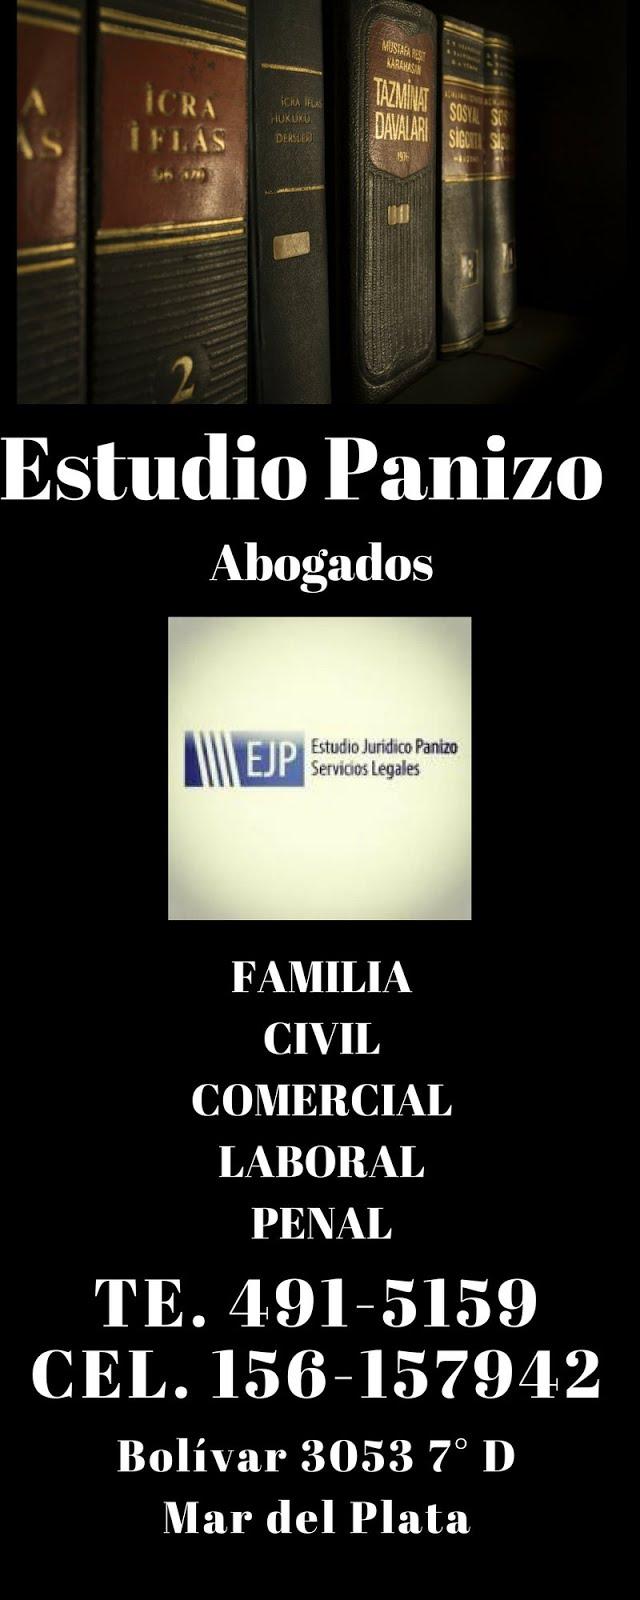 Abogados de Familia Mar del Plata | Dra. Fernanda Panizo | Divorcios Convenios Alimentos